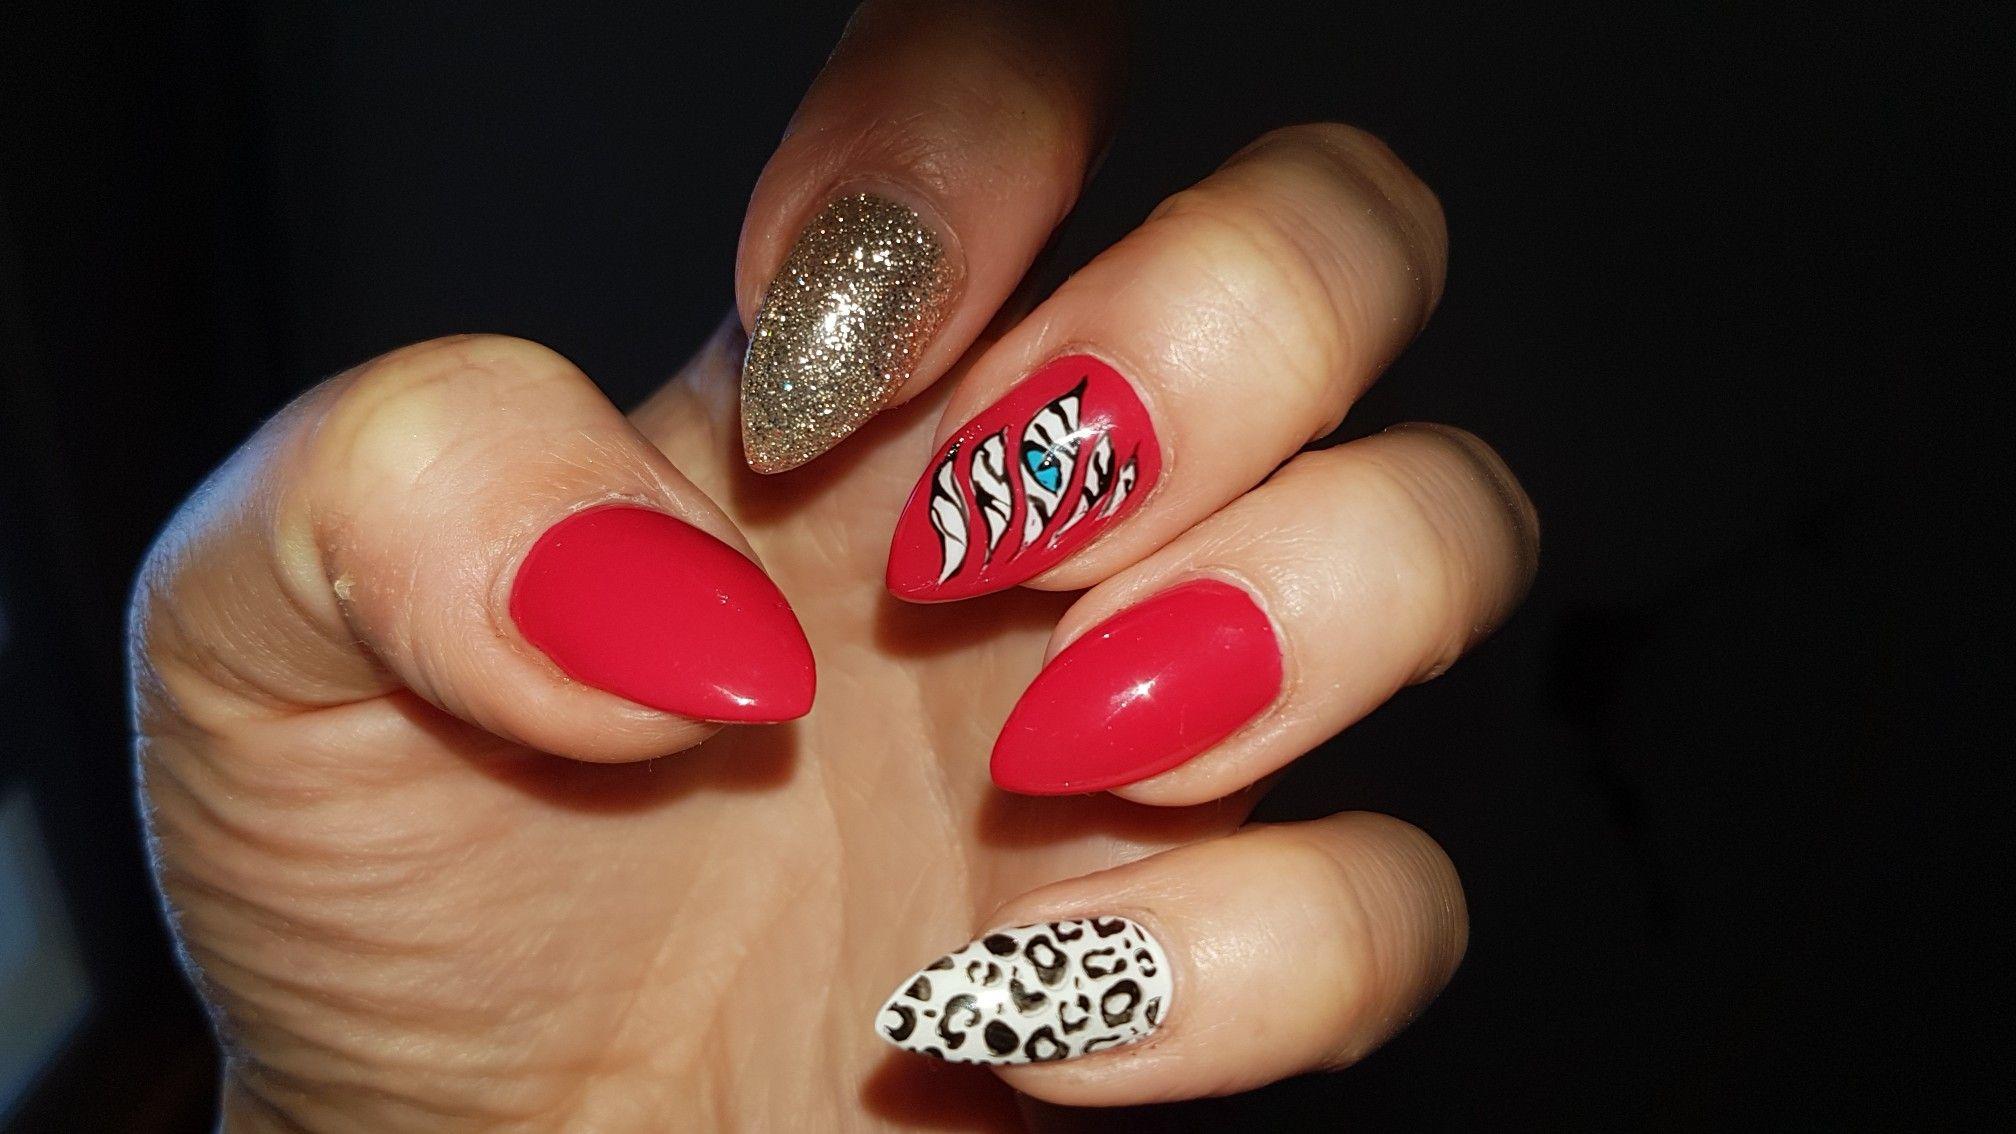 Pin By Oya Chetin On Stiletto Nails Design 3 Pinterest